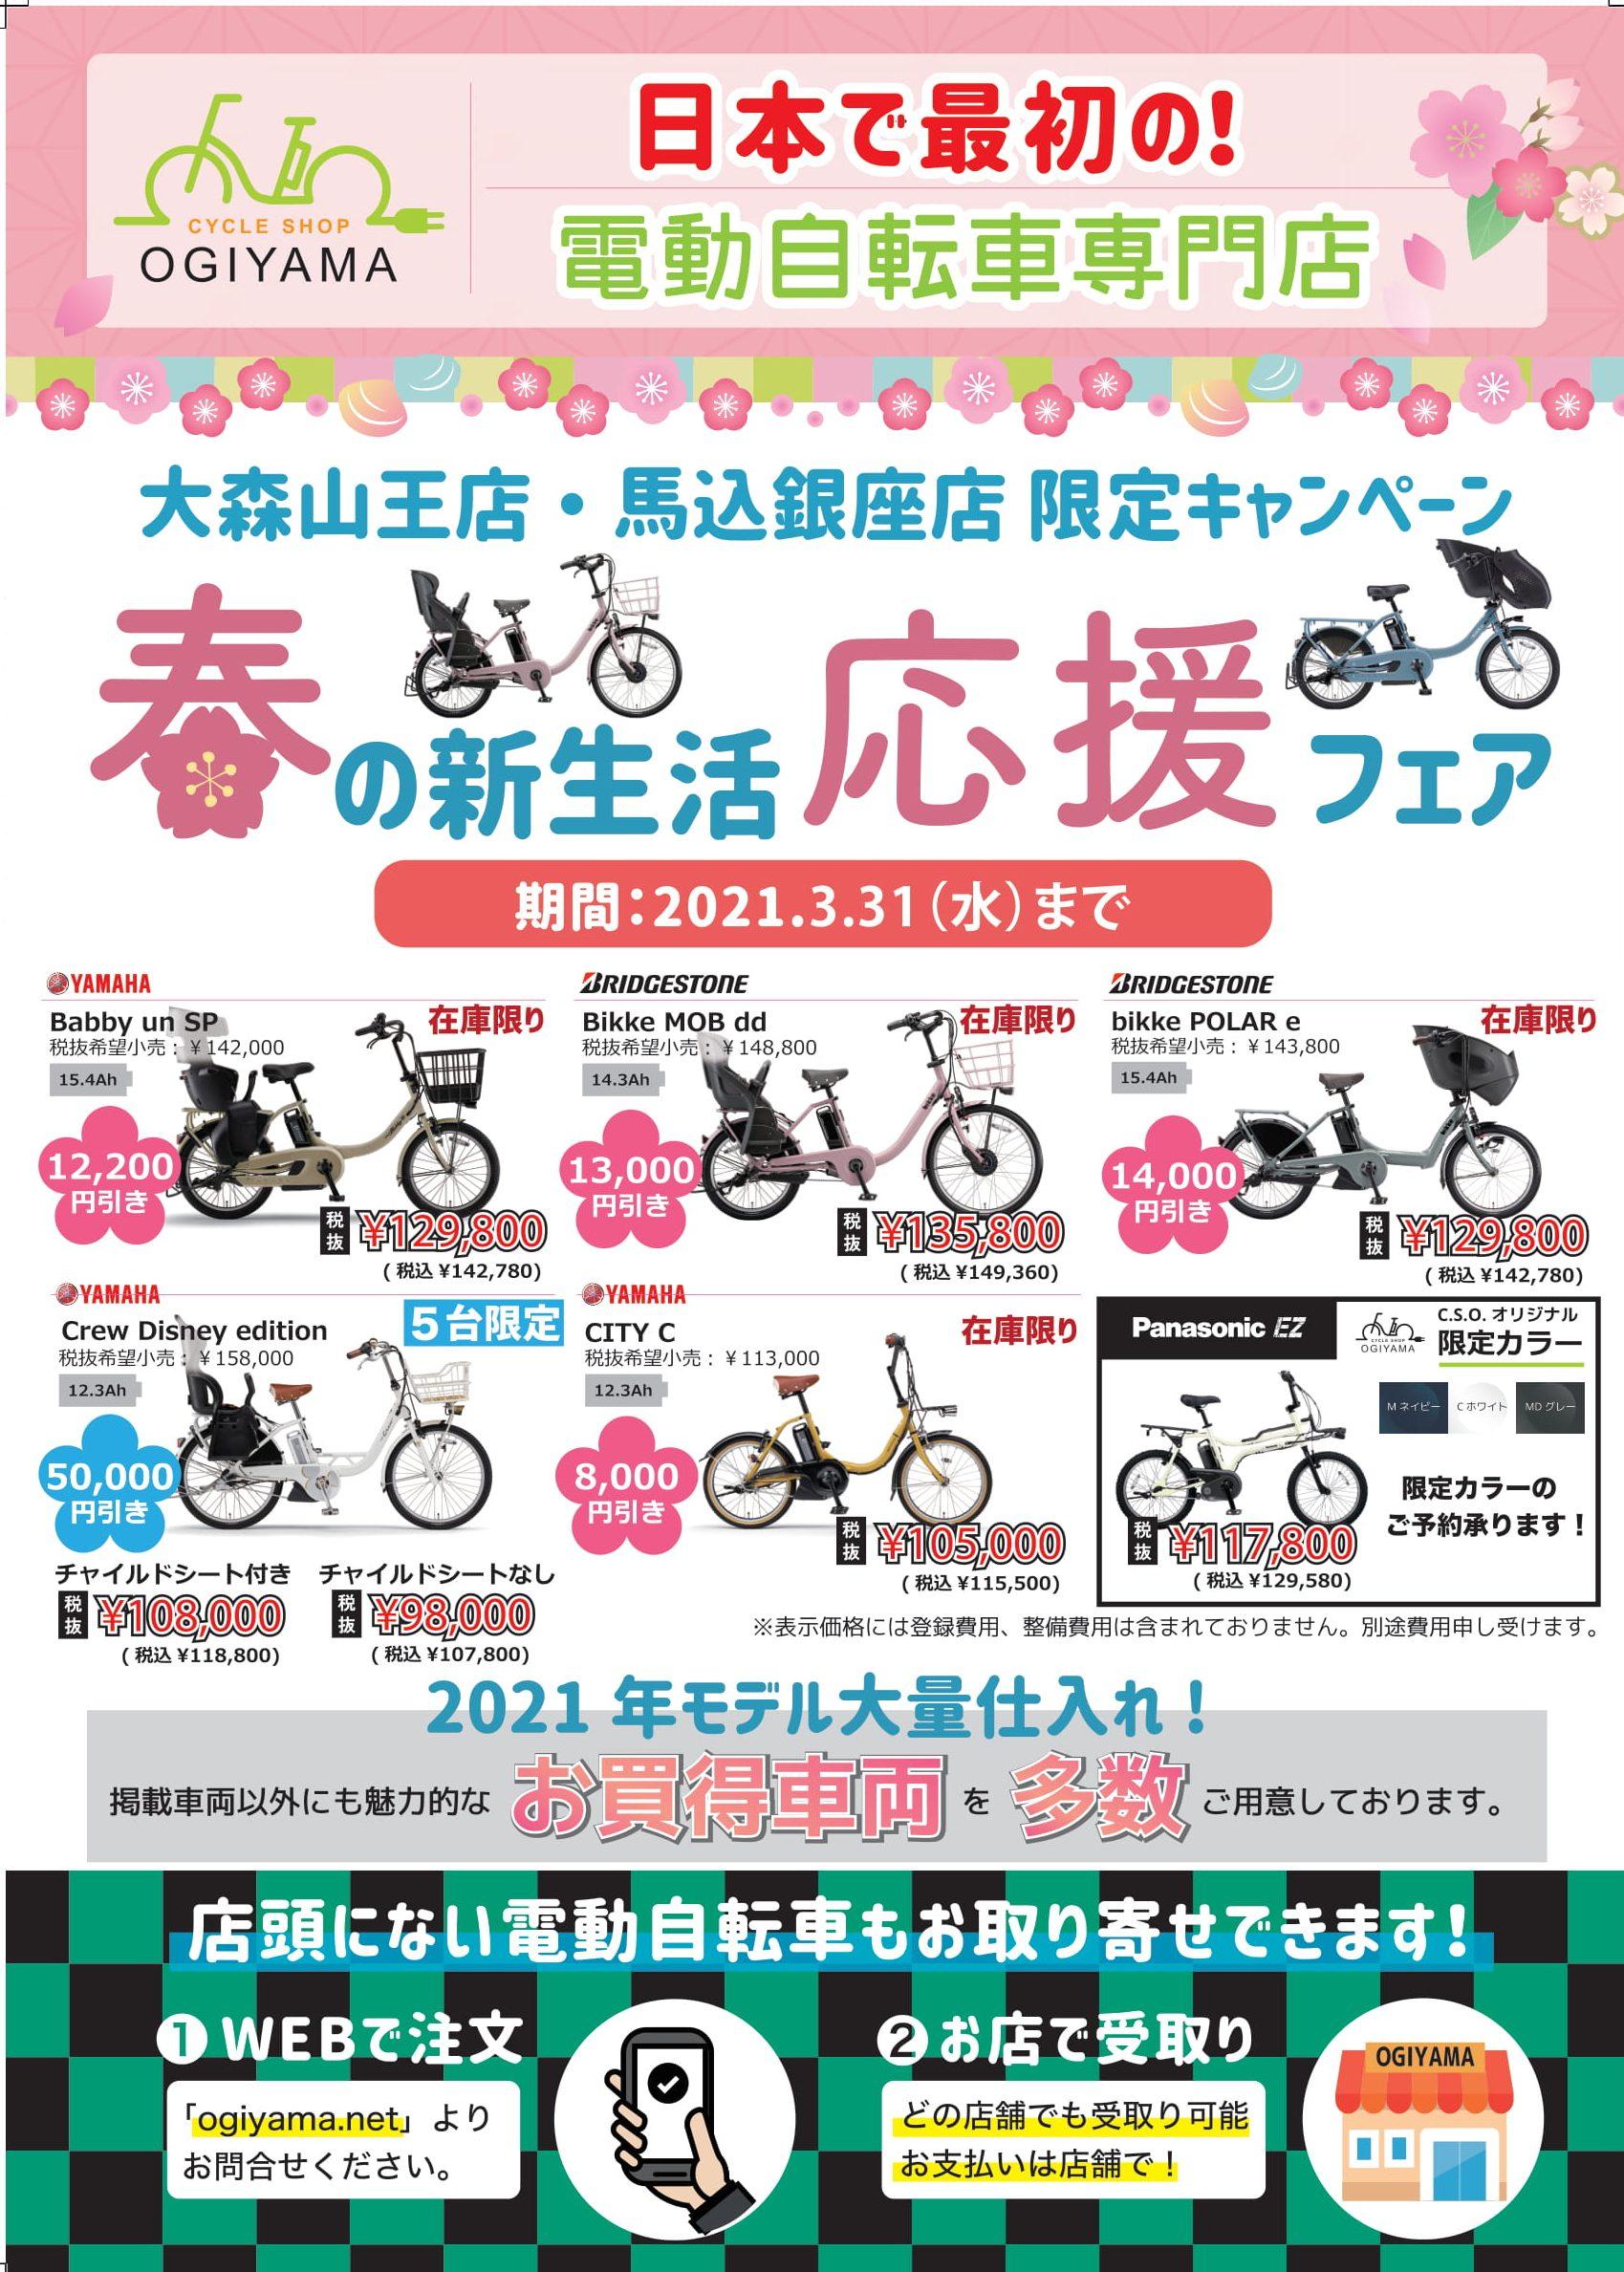 ★大森山王店★春の新生活応援フェア★